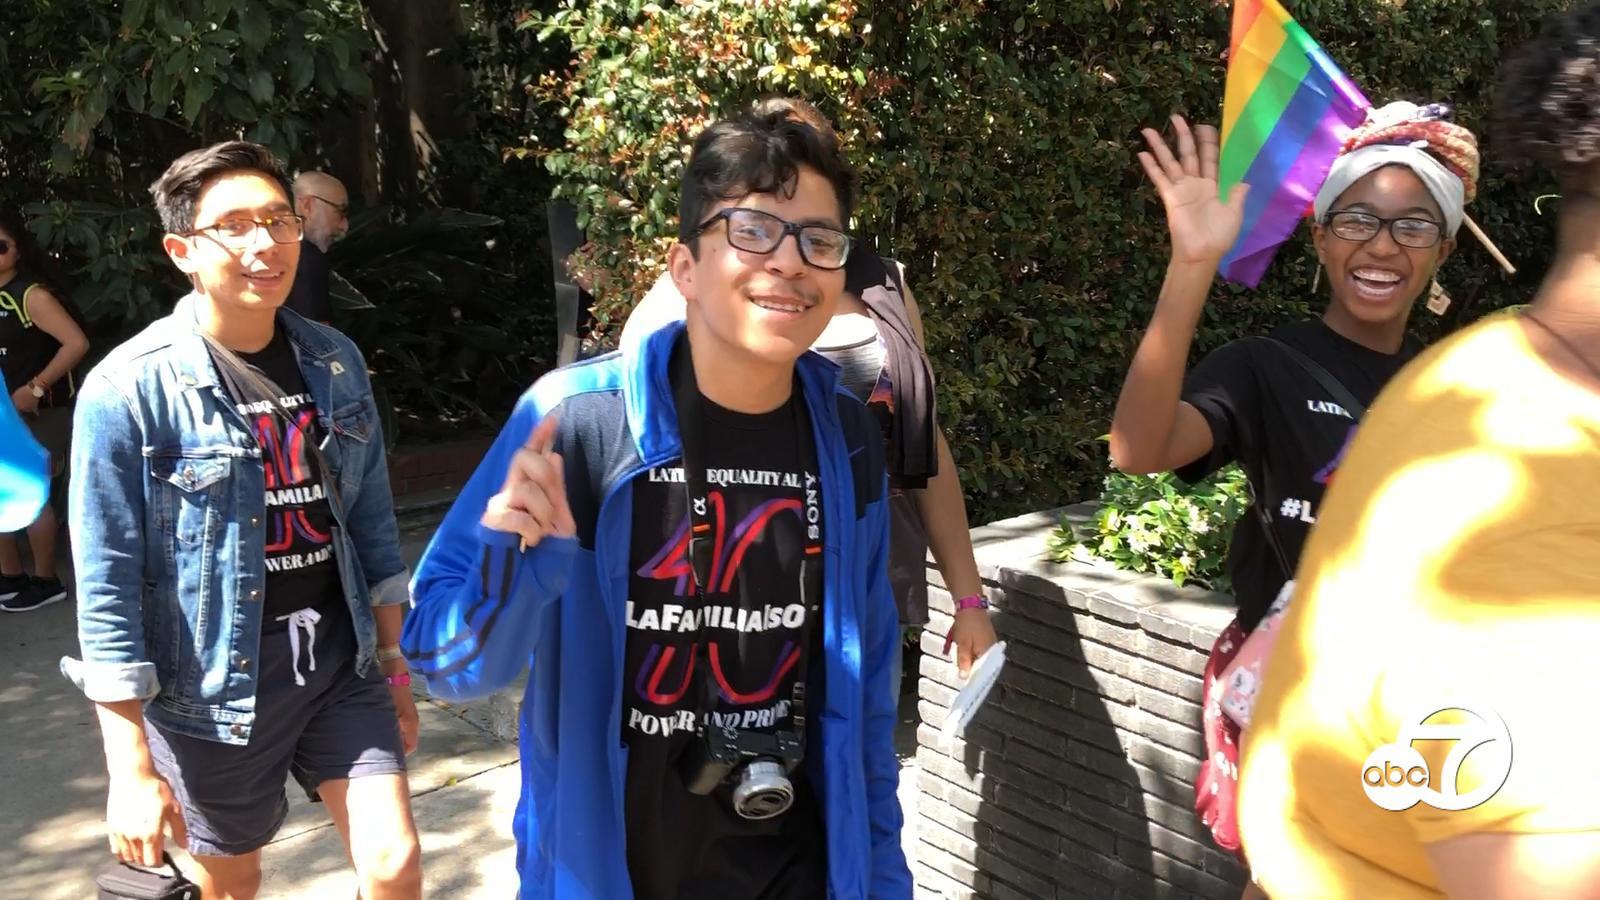 South La Gay Teen Empowered Through Latino Equality -3334